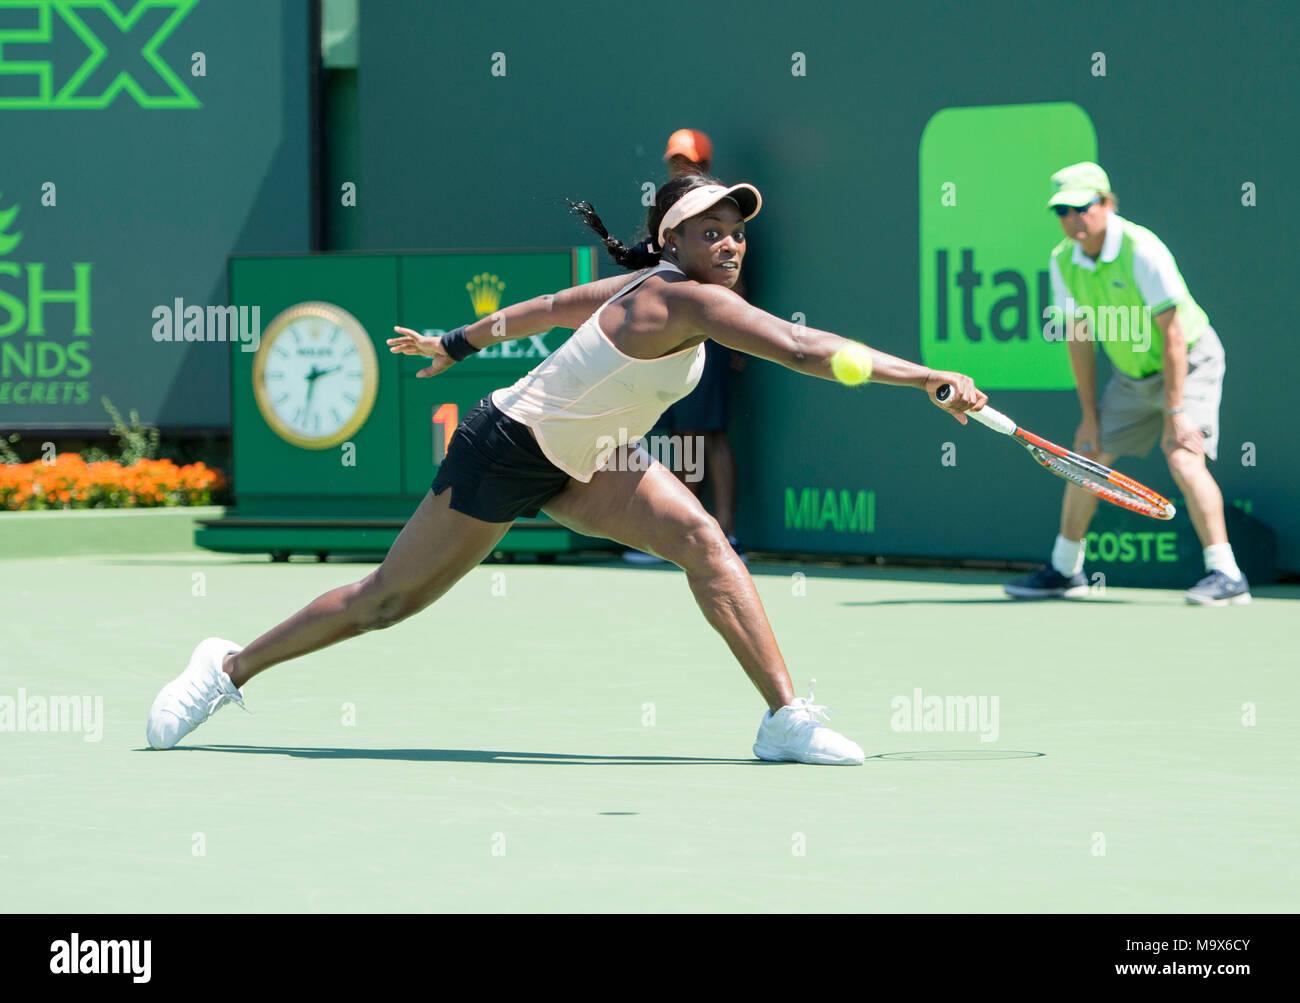 Miami, Key Biscayne, Florida, Stati Uniti d'America. 26 Mar, 2018. Sloane Stephens (USA) sconfitte Garbine Muguruza (ESP) da 6-3, 6-4, al Miami aprire suonata in Crandon Park Tennis Center di Miami, Key Biscayne, Florida. © Karla Kinne/Tennisclix/CSM/Alamy Live News Foto Stock